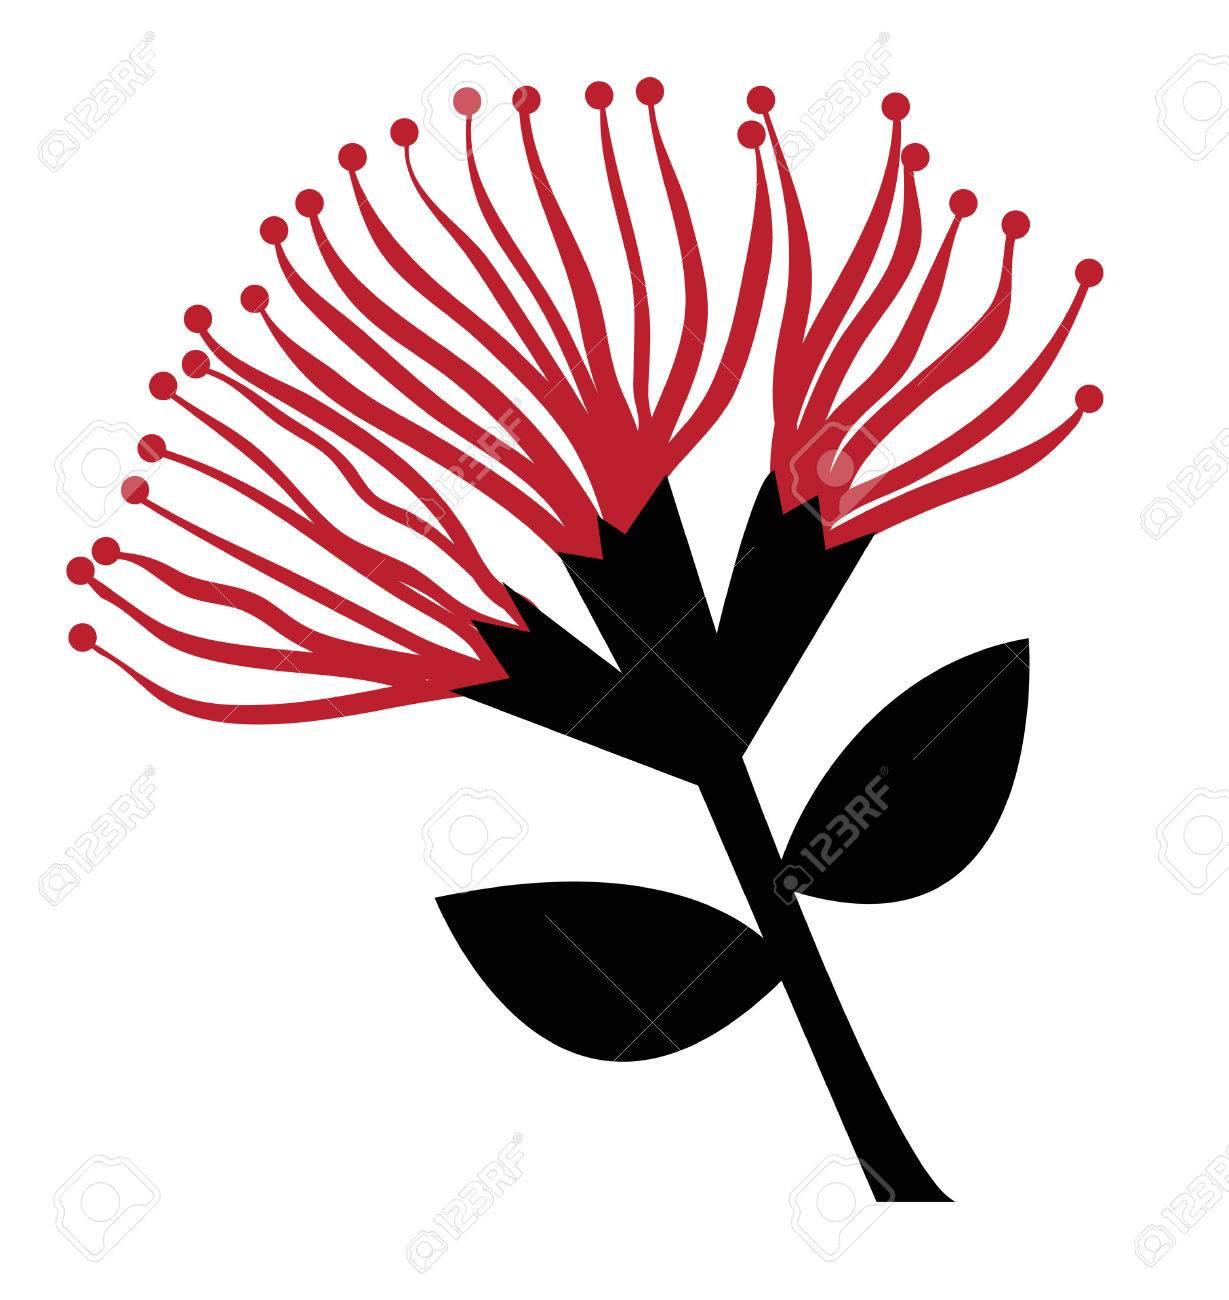 Pohutukawa Flower - 69483239